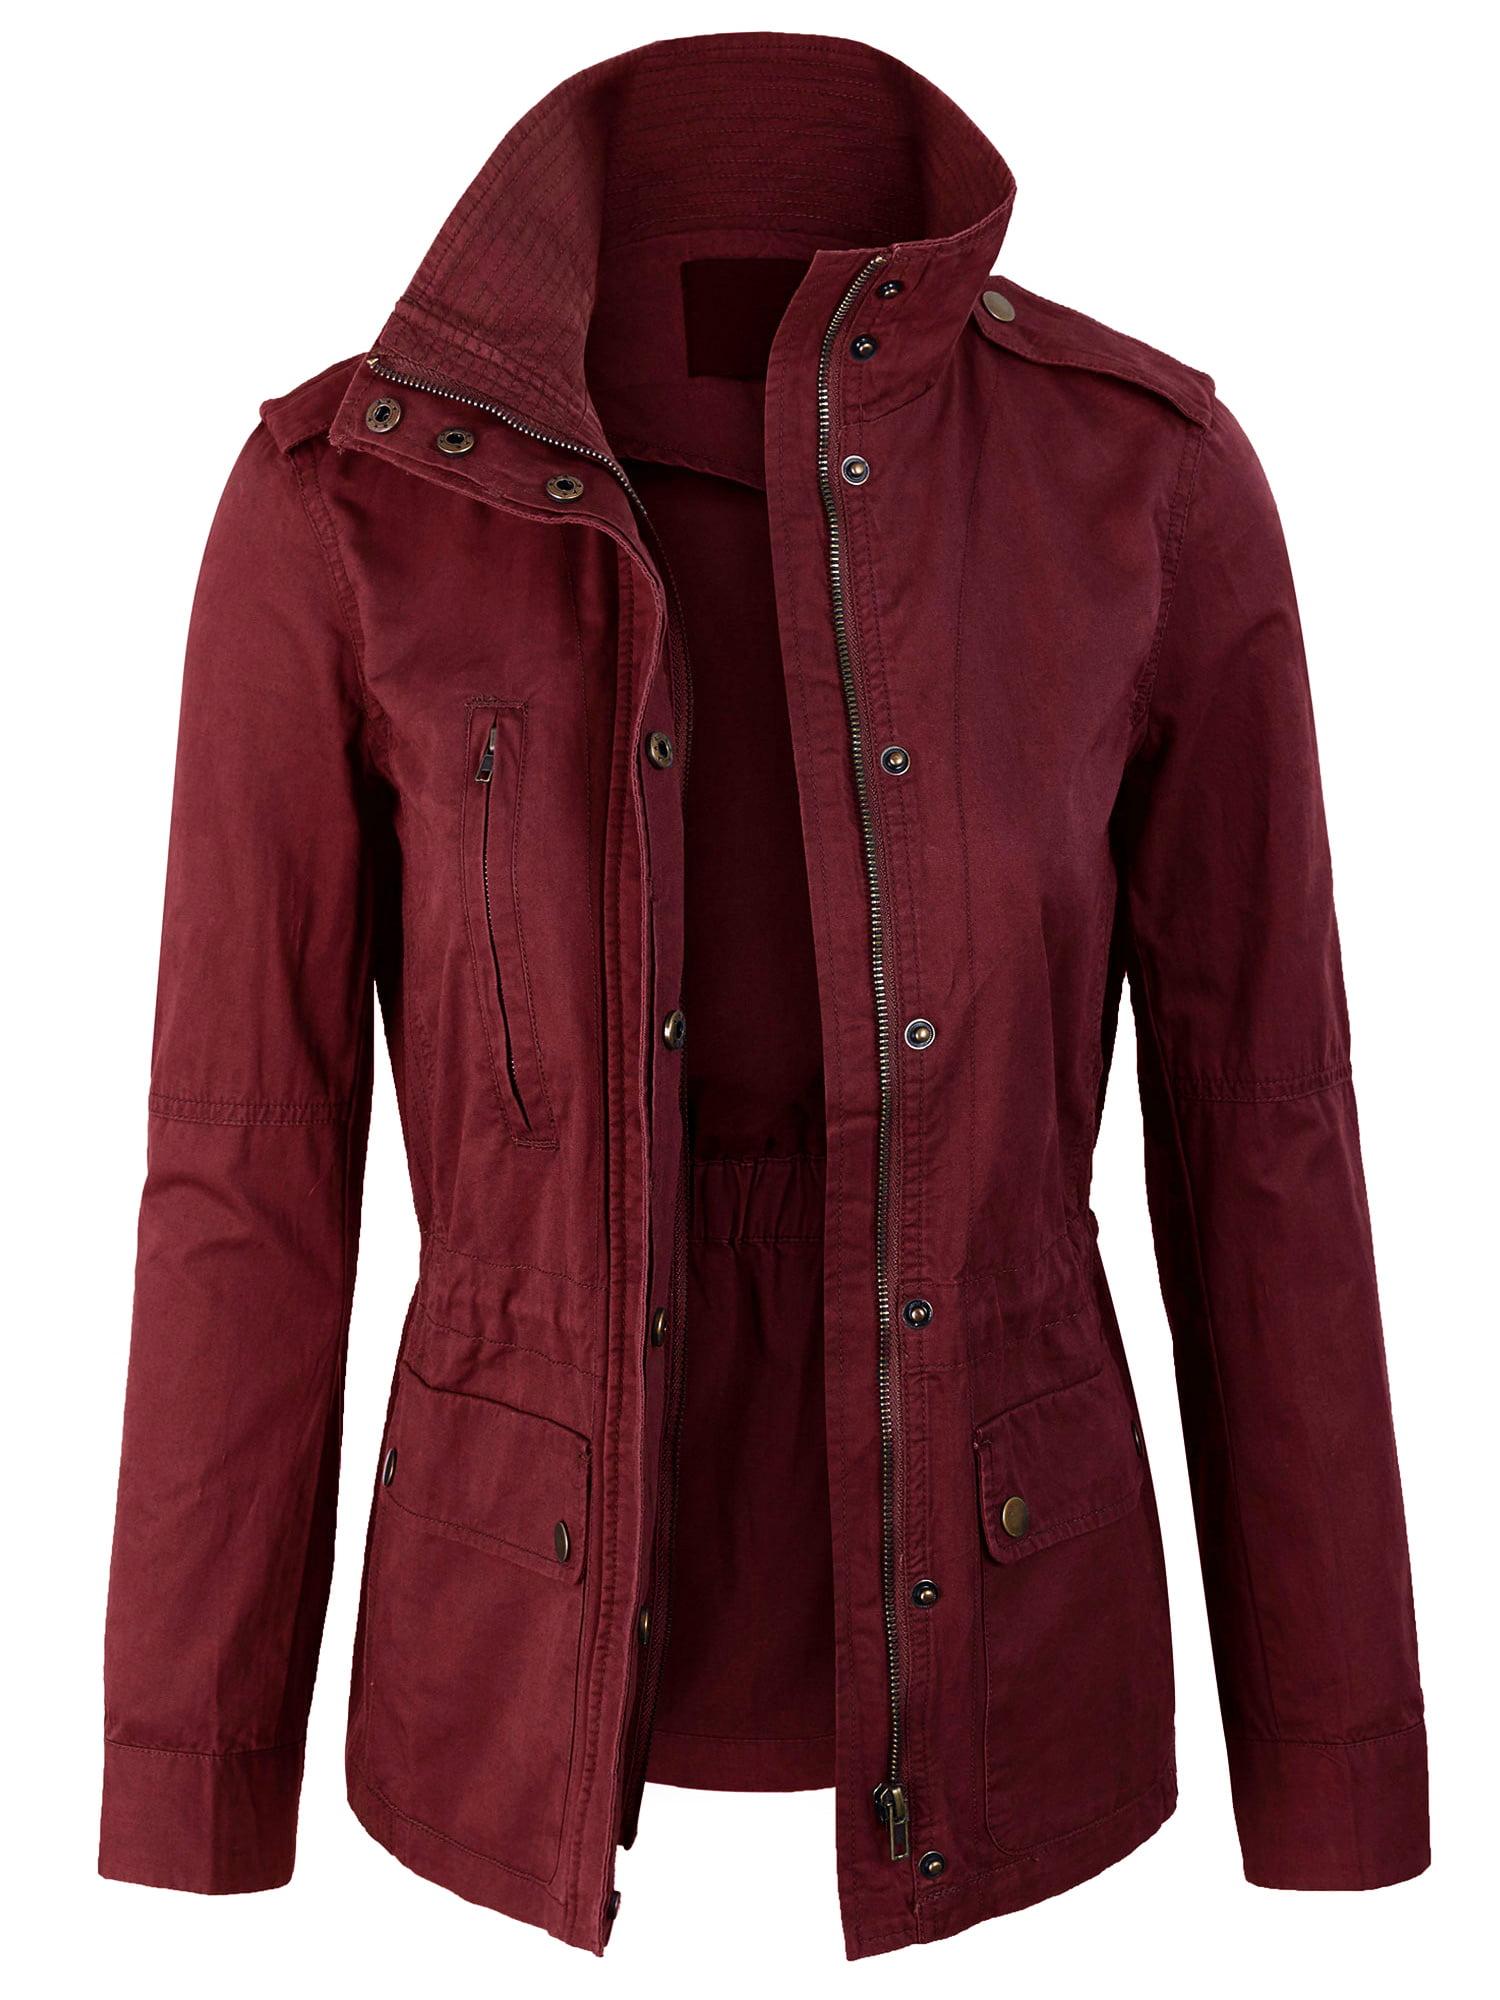 Womens Zip Up Military Anorak Safari Jacket Coat